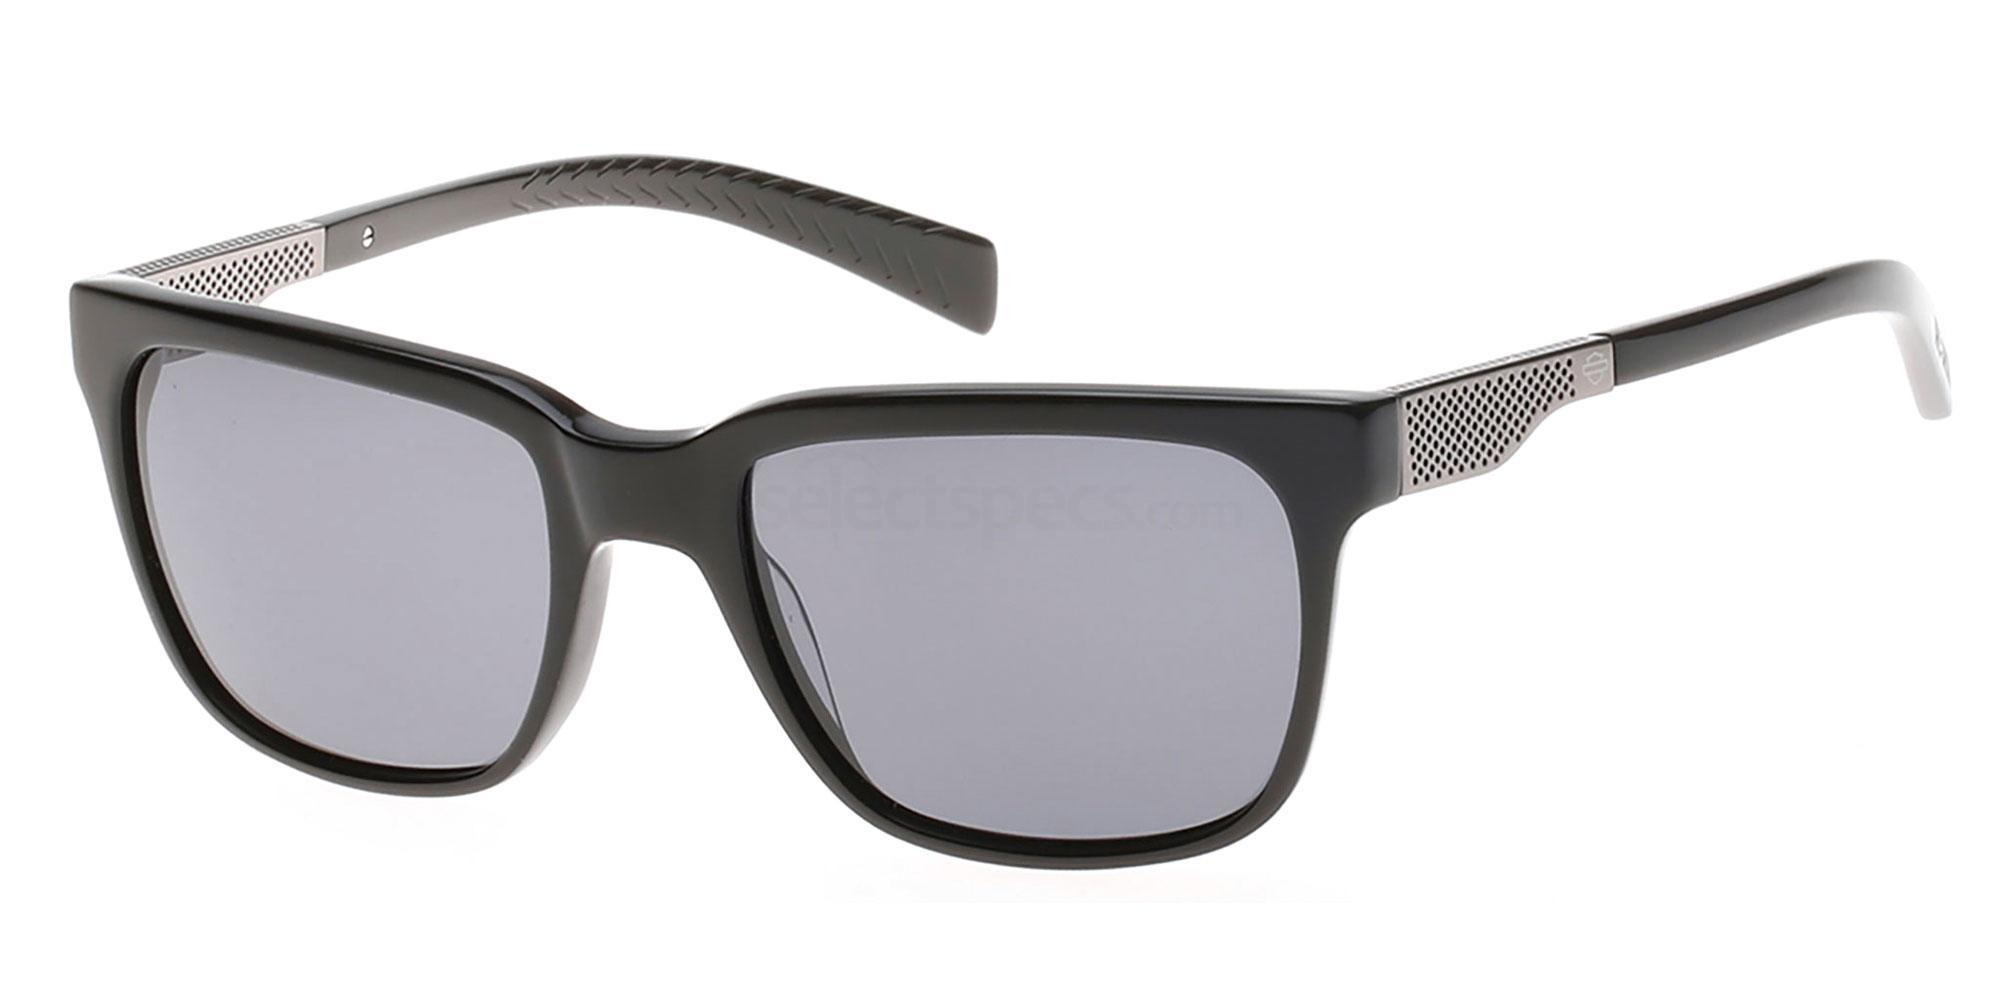 01A HD2007 Sunglasses, Harley Davidson